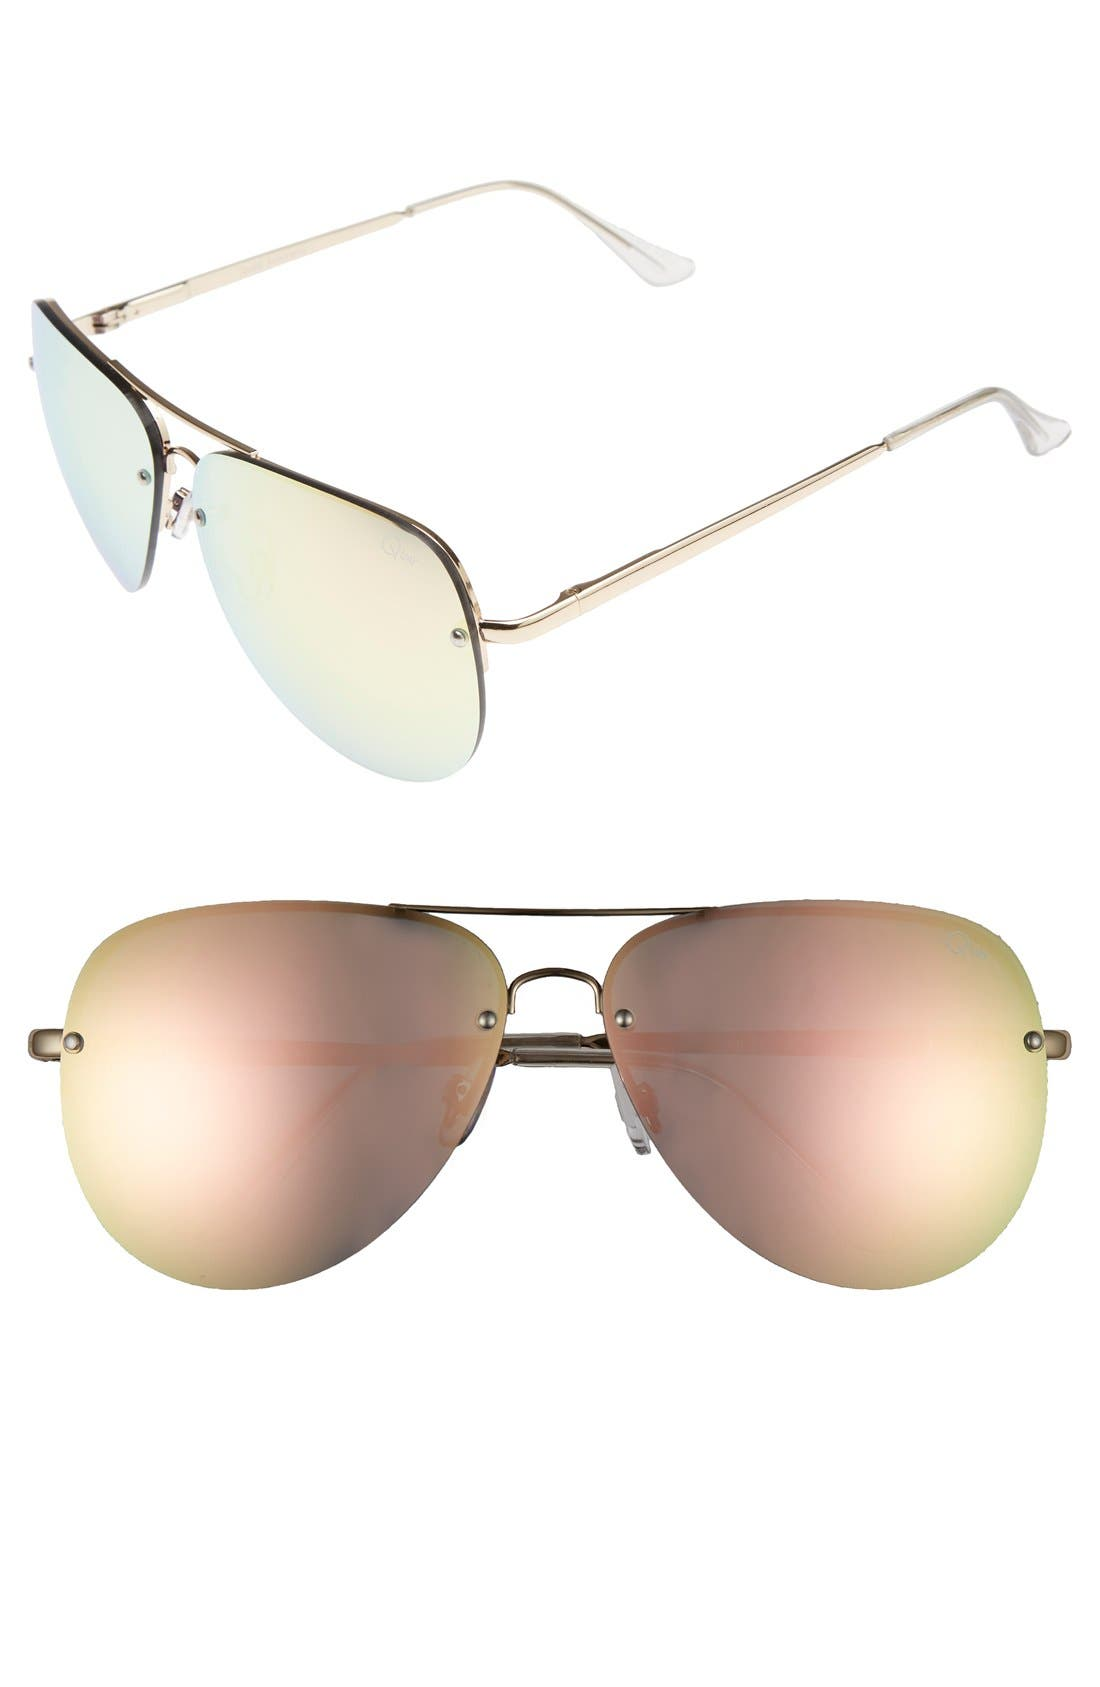 Quay Australia Muse 65mm Mirrored Aviator Sunglasses